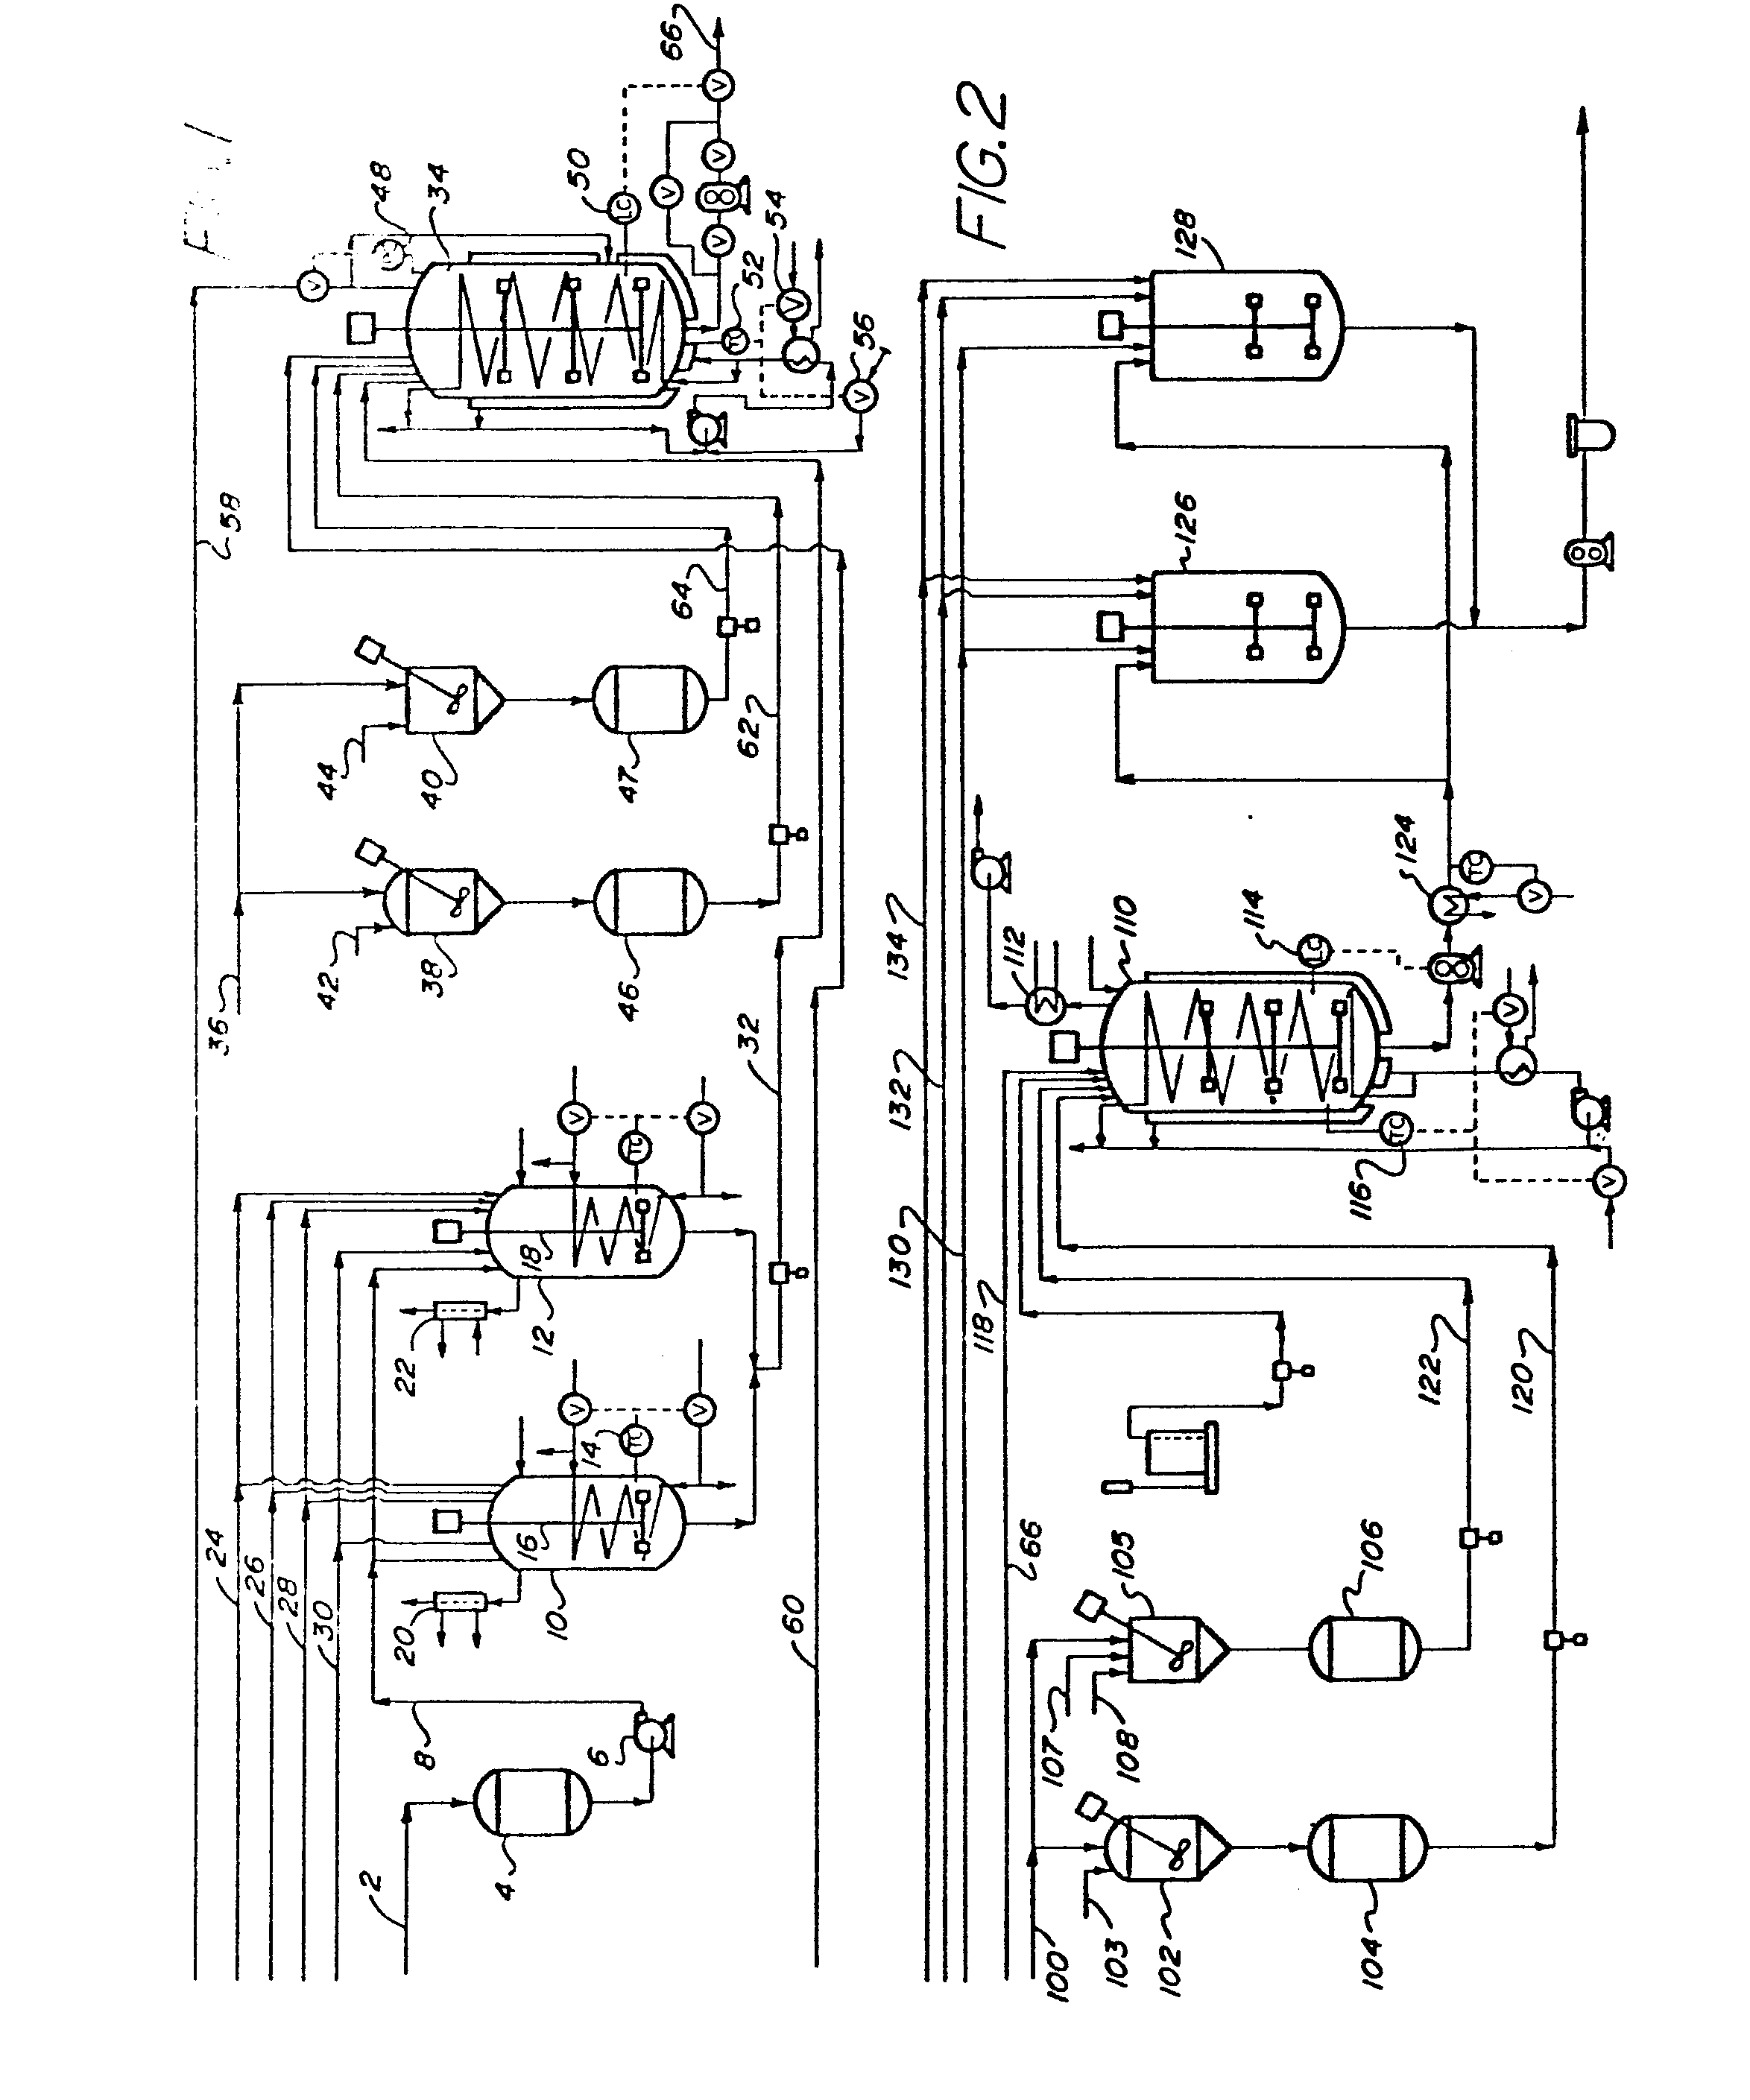 patent ep0005073a2